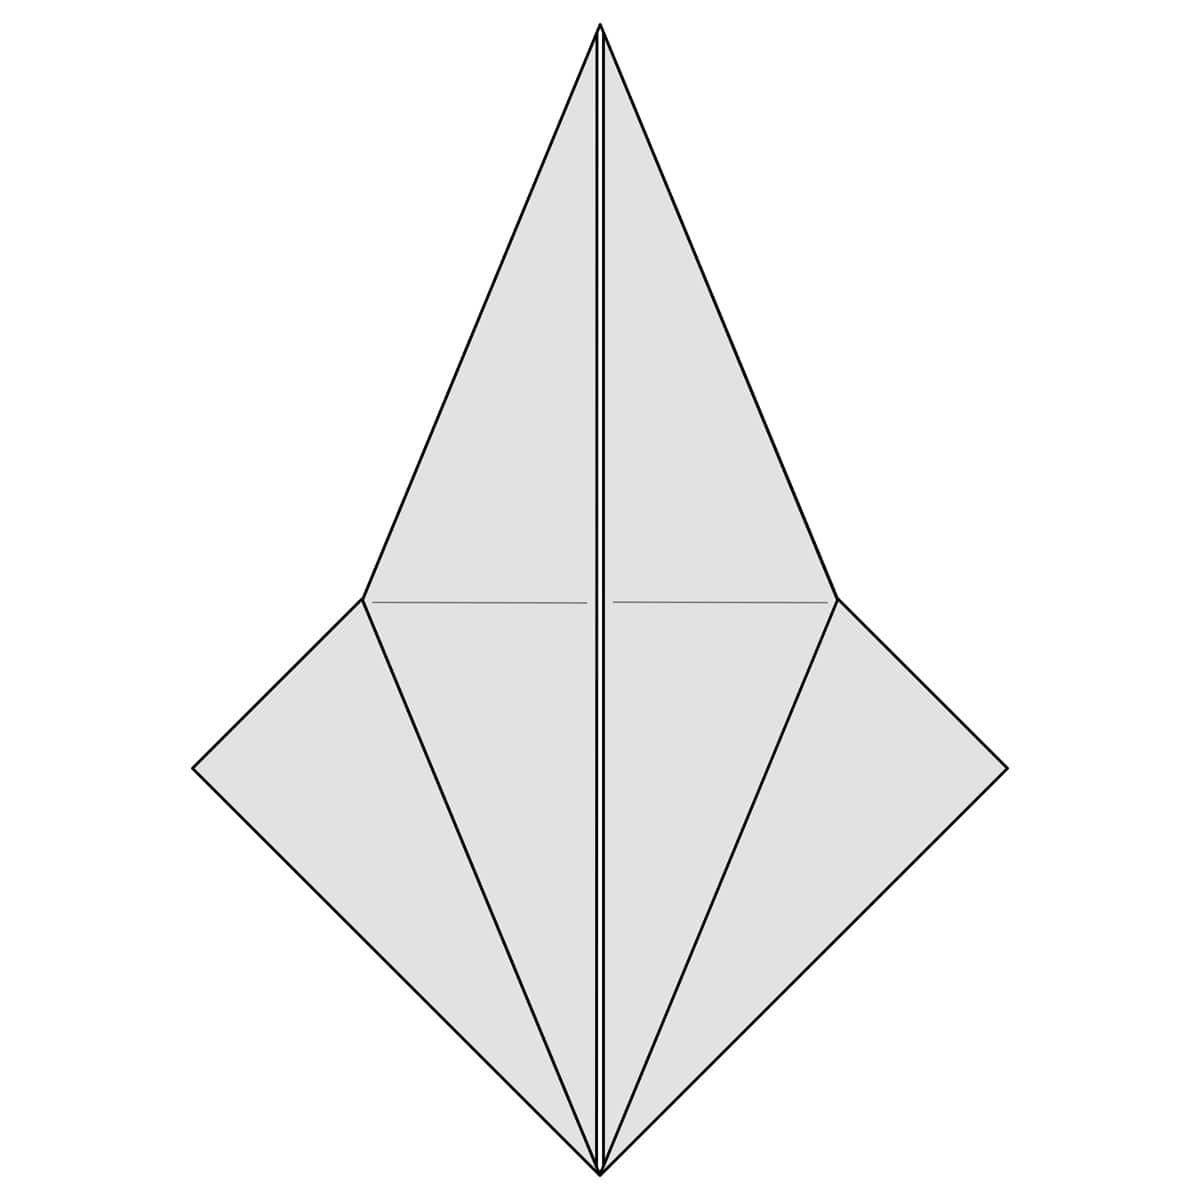 Petal Fold Step 10